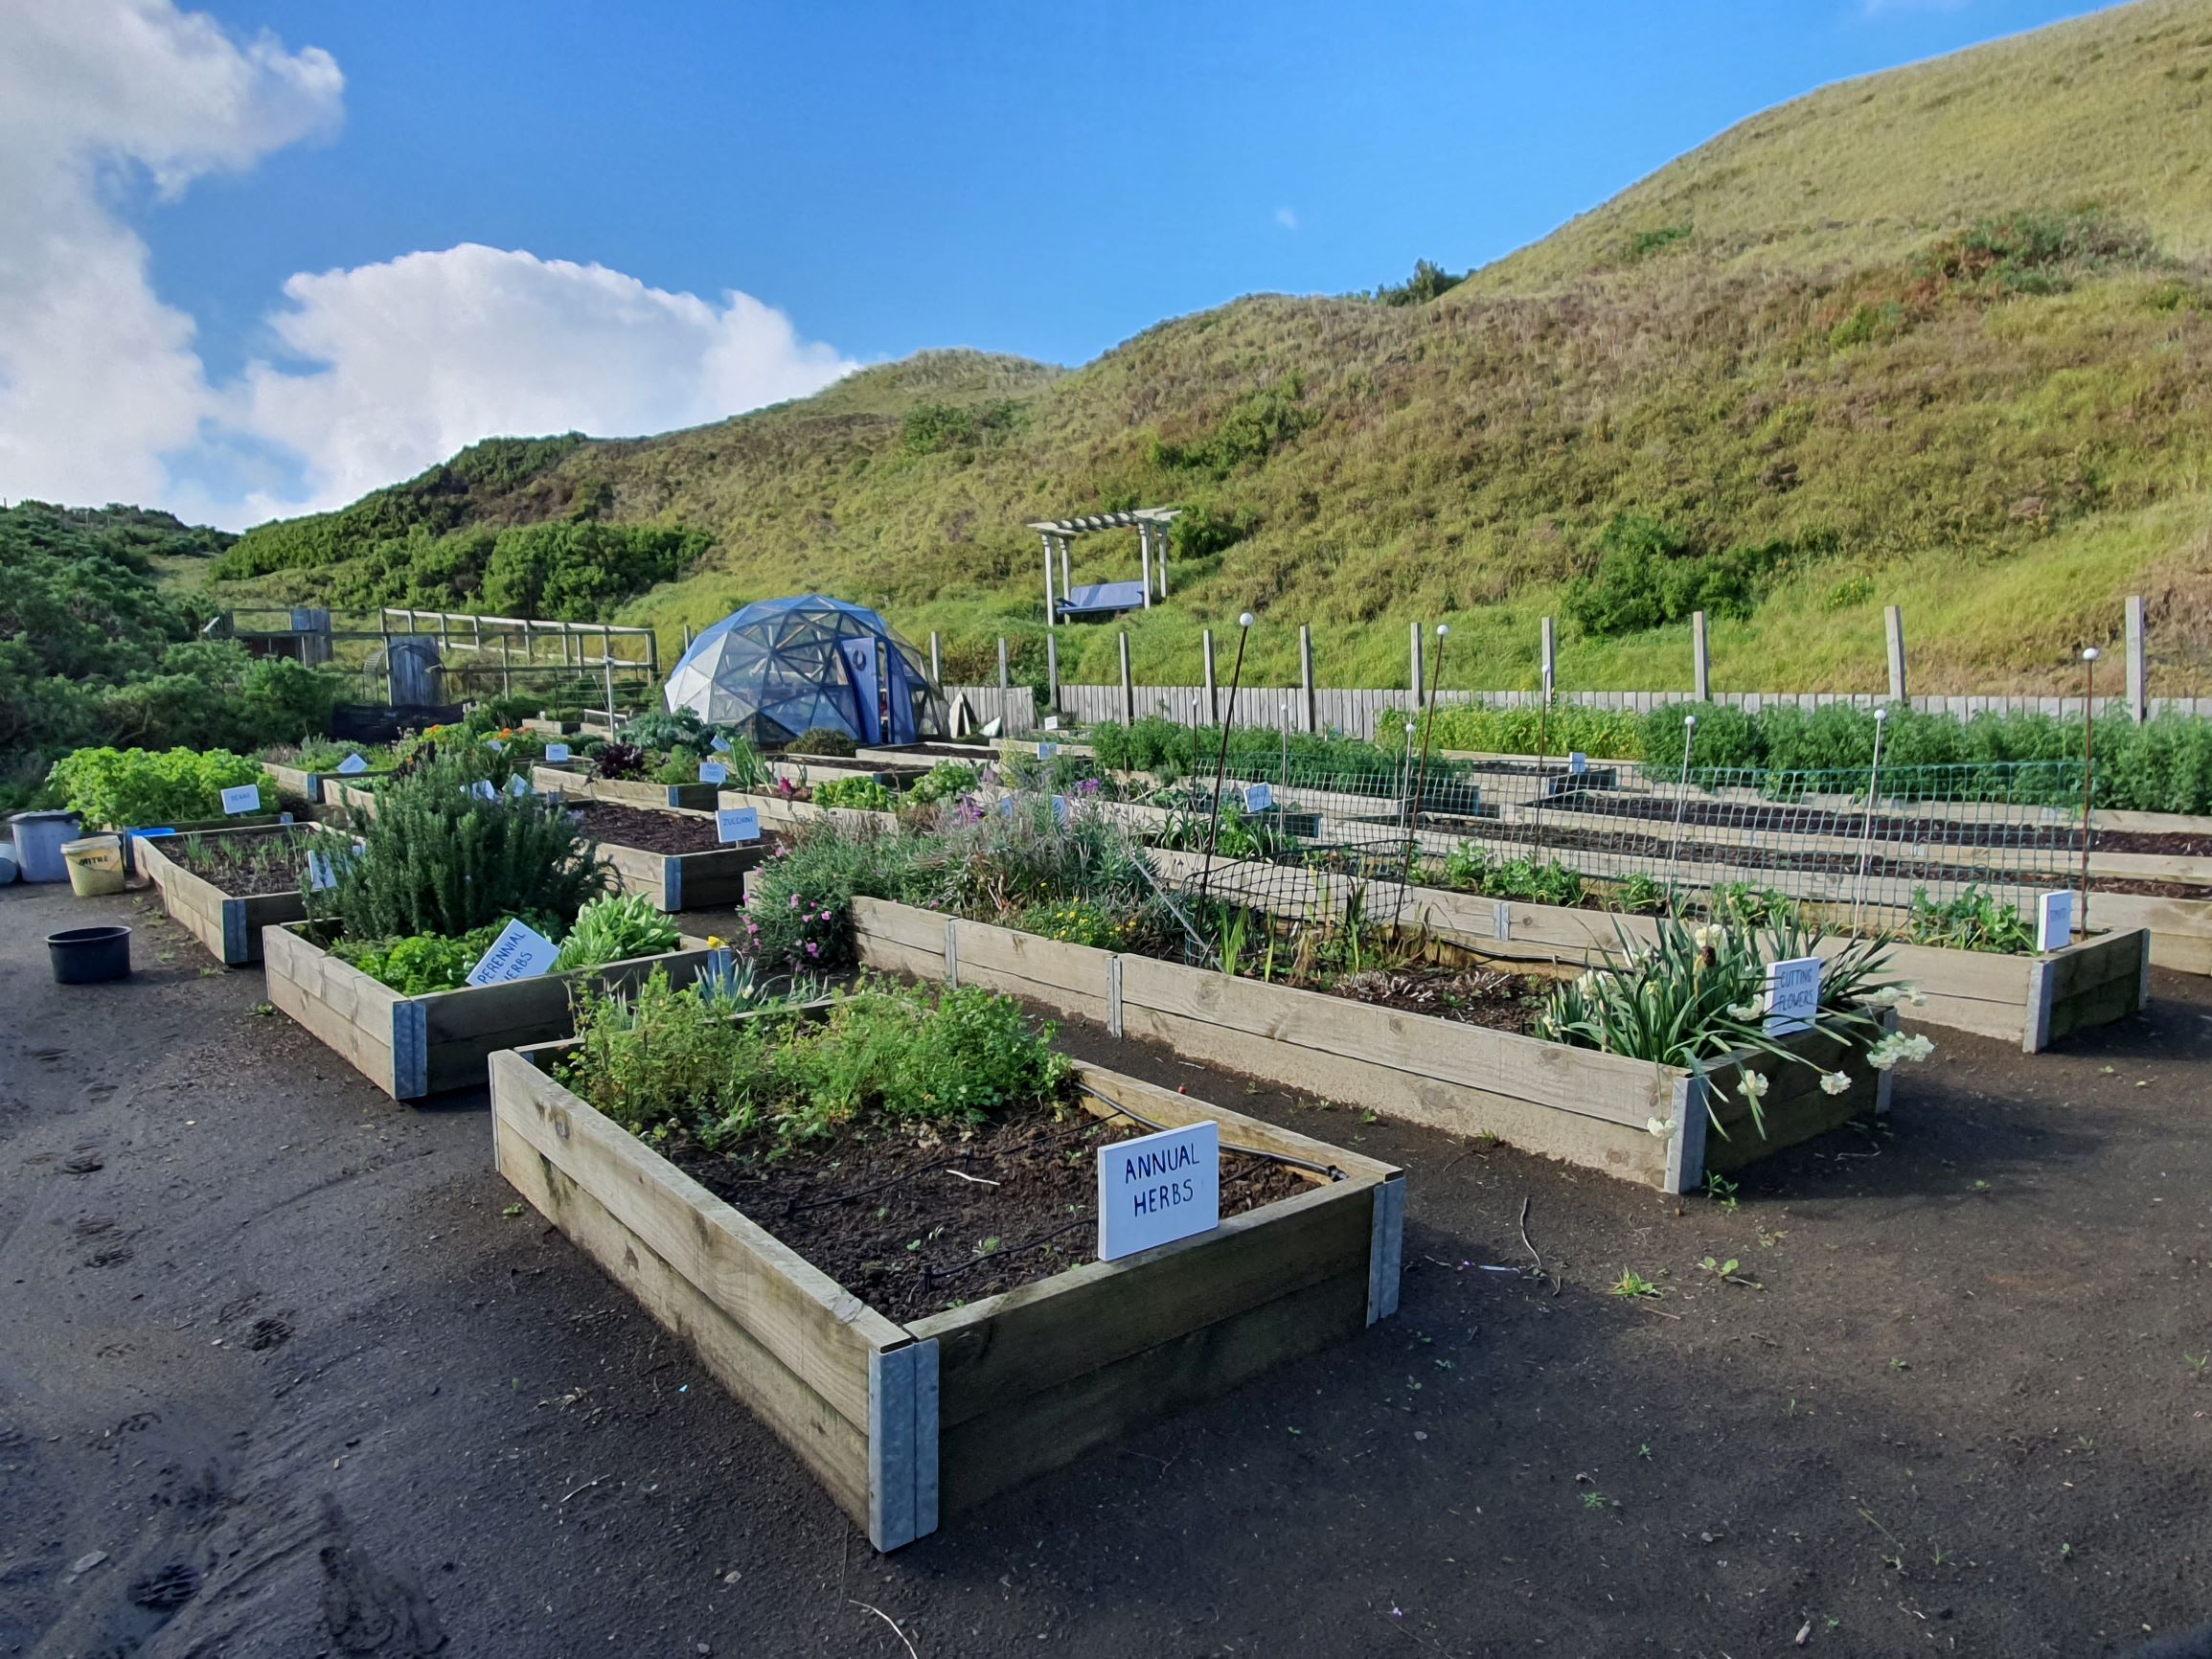 The vegie garden